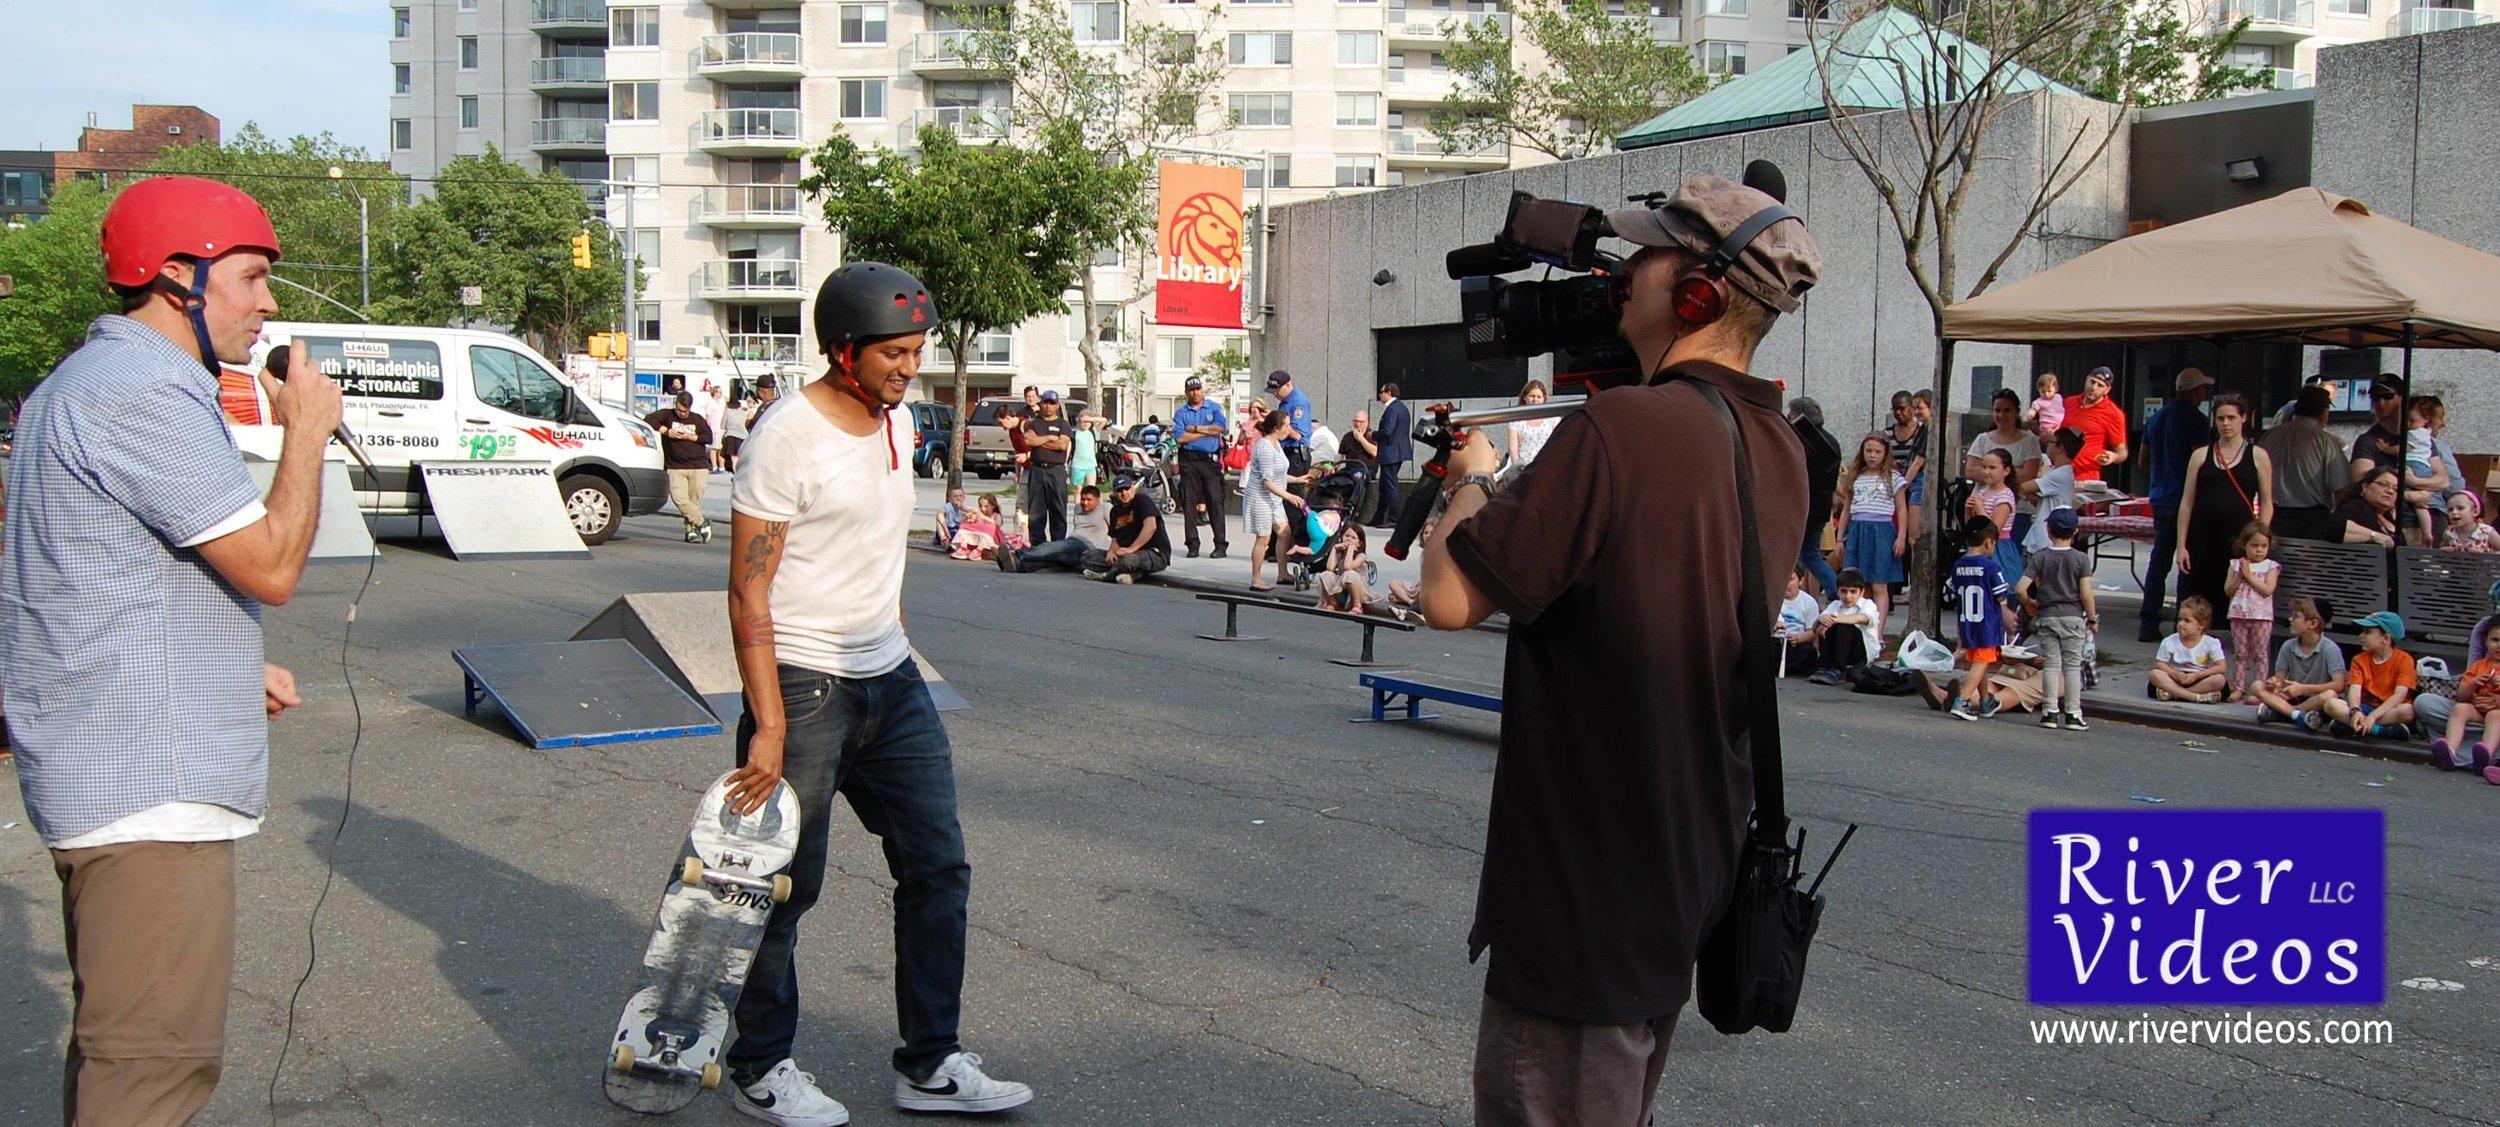 Filming Skate Boarder #2.jpg